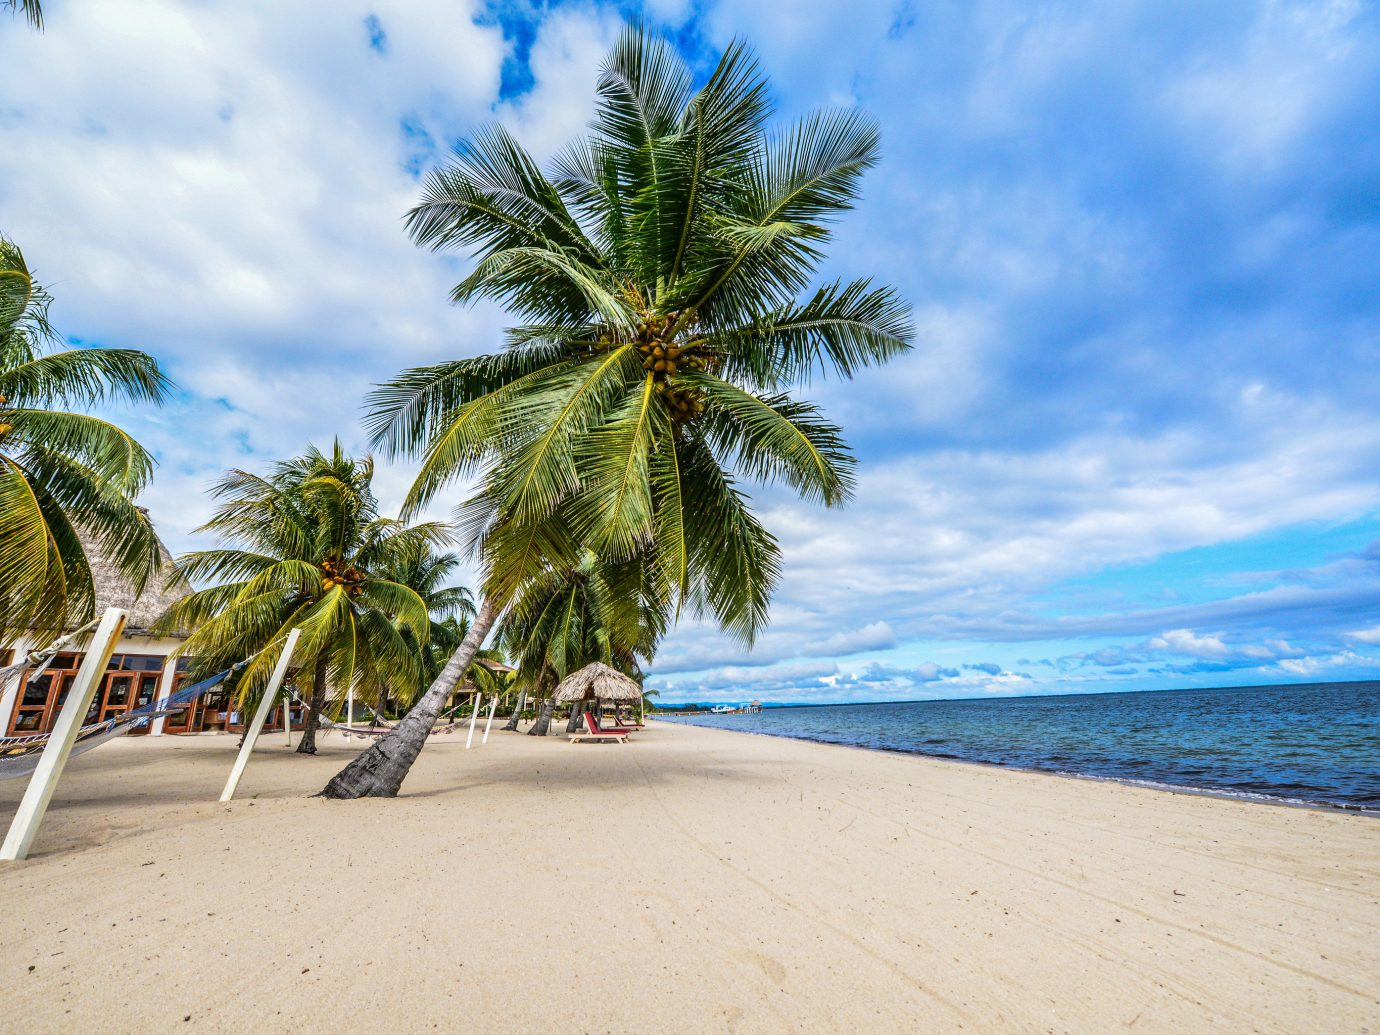 Trip Ideas tree sky outdoor Beach palm water body of water Sea shore Ocean vacation Coast caribbean tropics arecales palm family plant cape bay sand Island walkway sandy lined